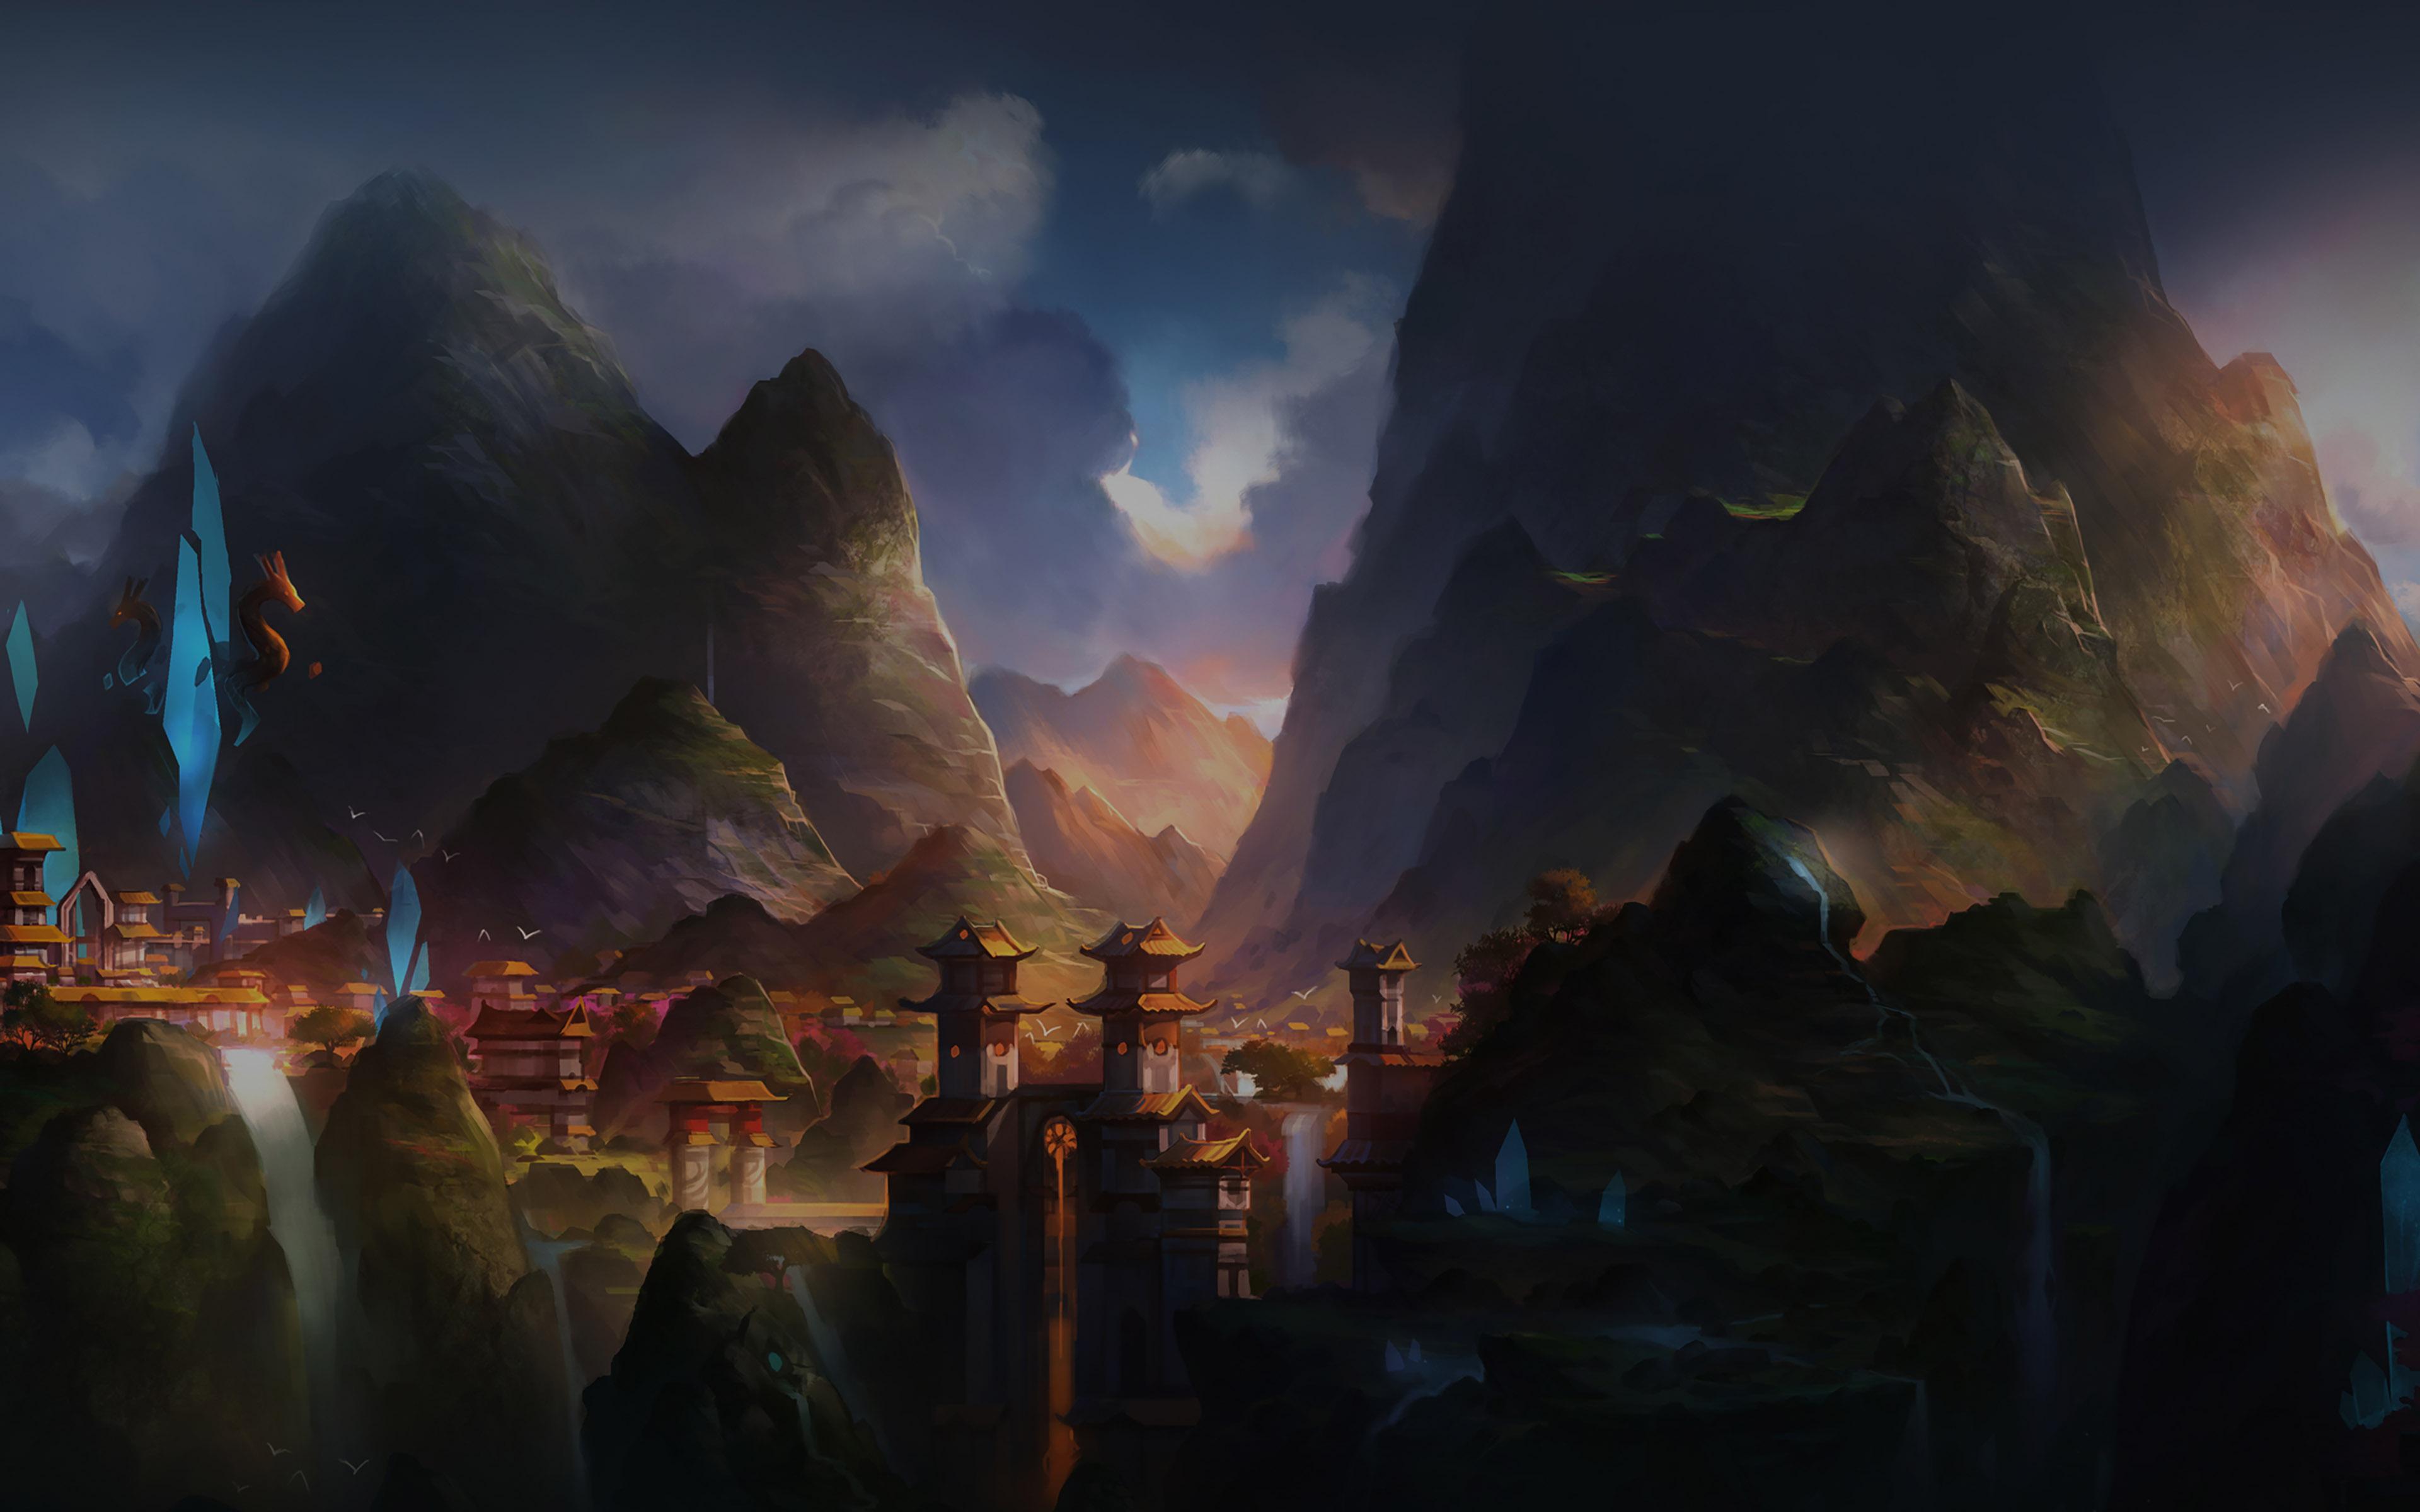 Af68 Mountain Art Illust China Anime Peaceful